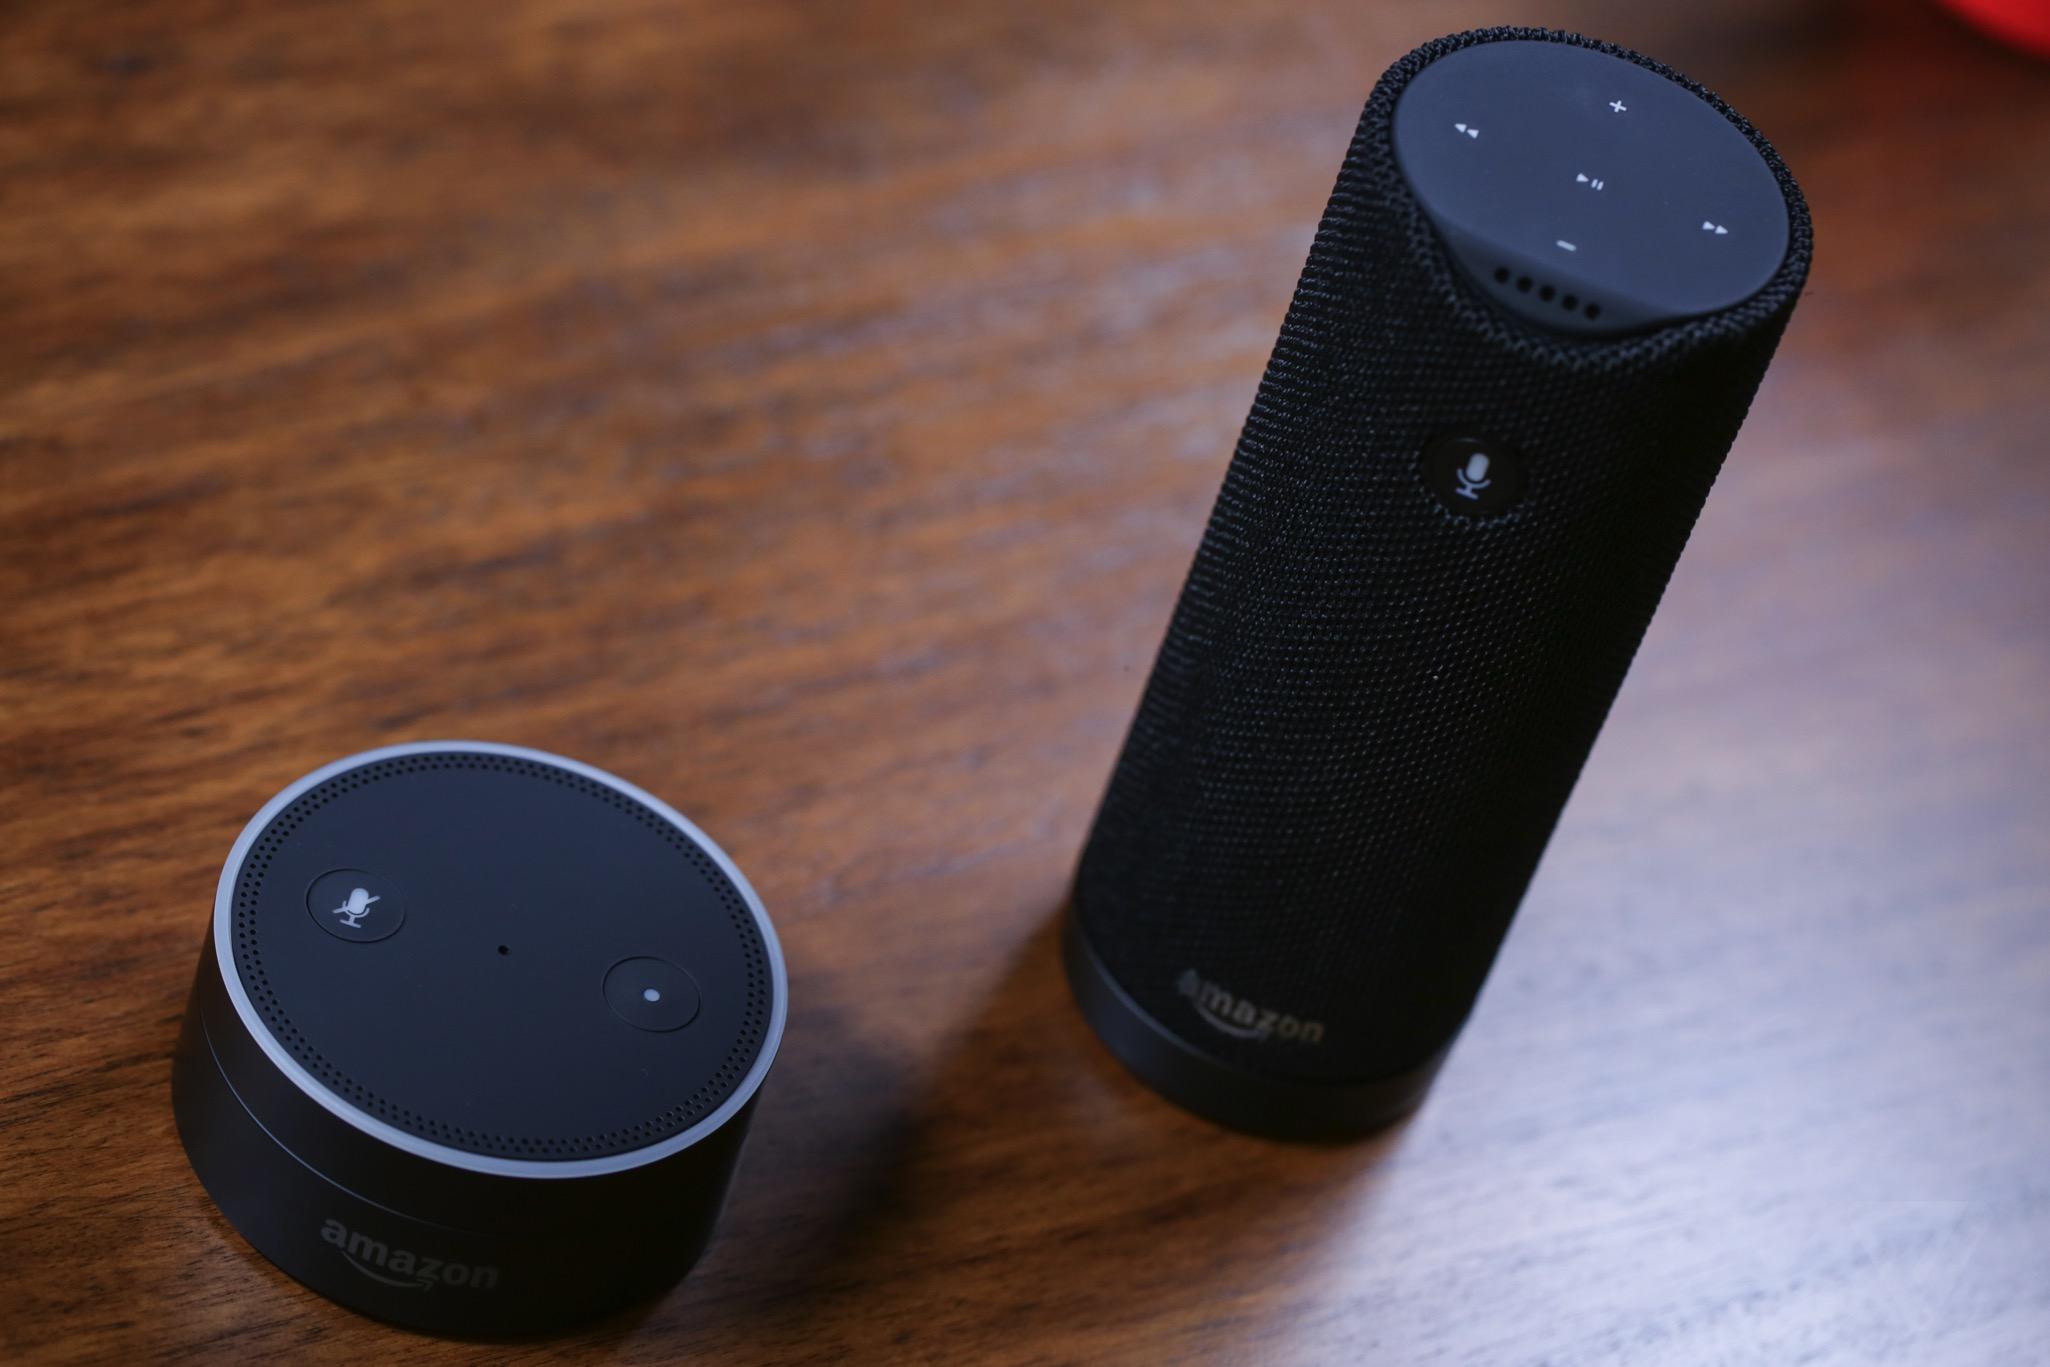 Amazon's Echo Dot lets you put Alexa inside any speaker - The Verge